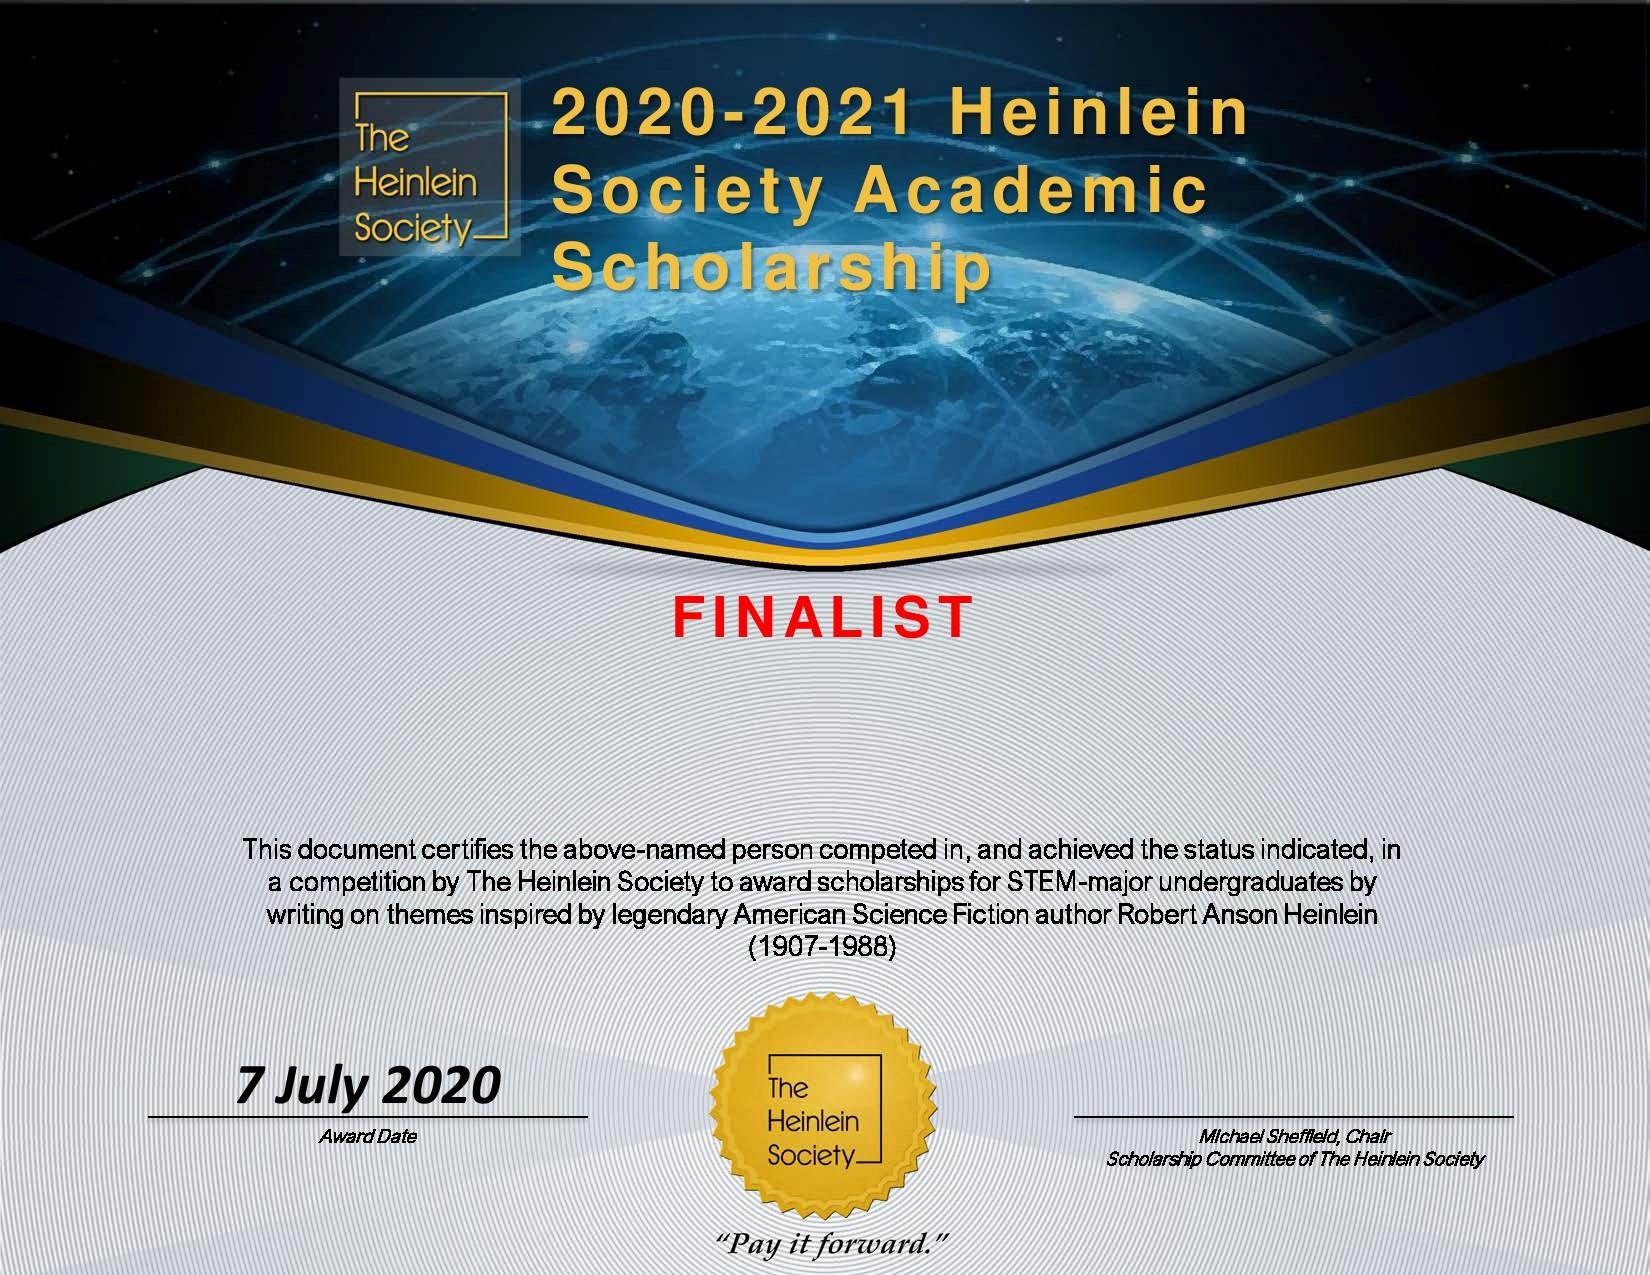 Heinlein Society Scholarships Certificate